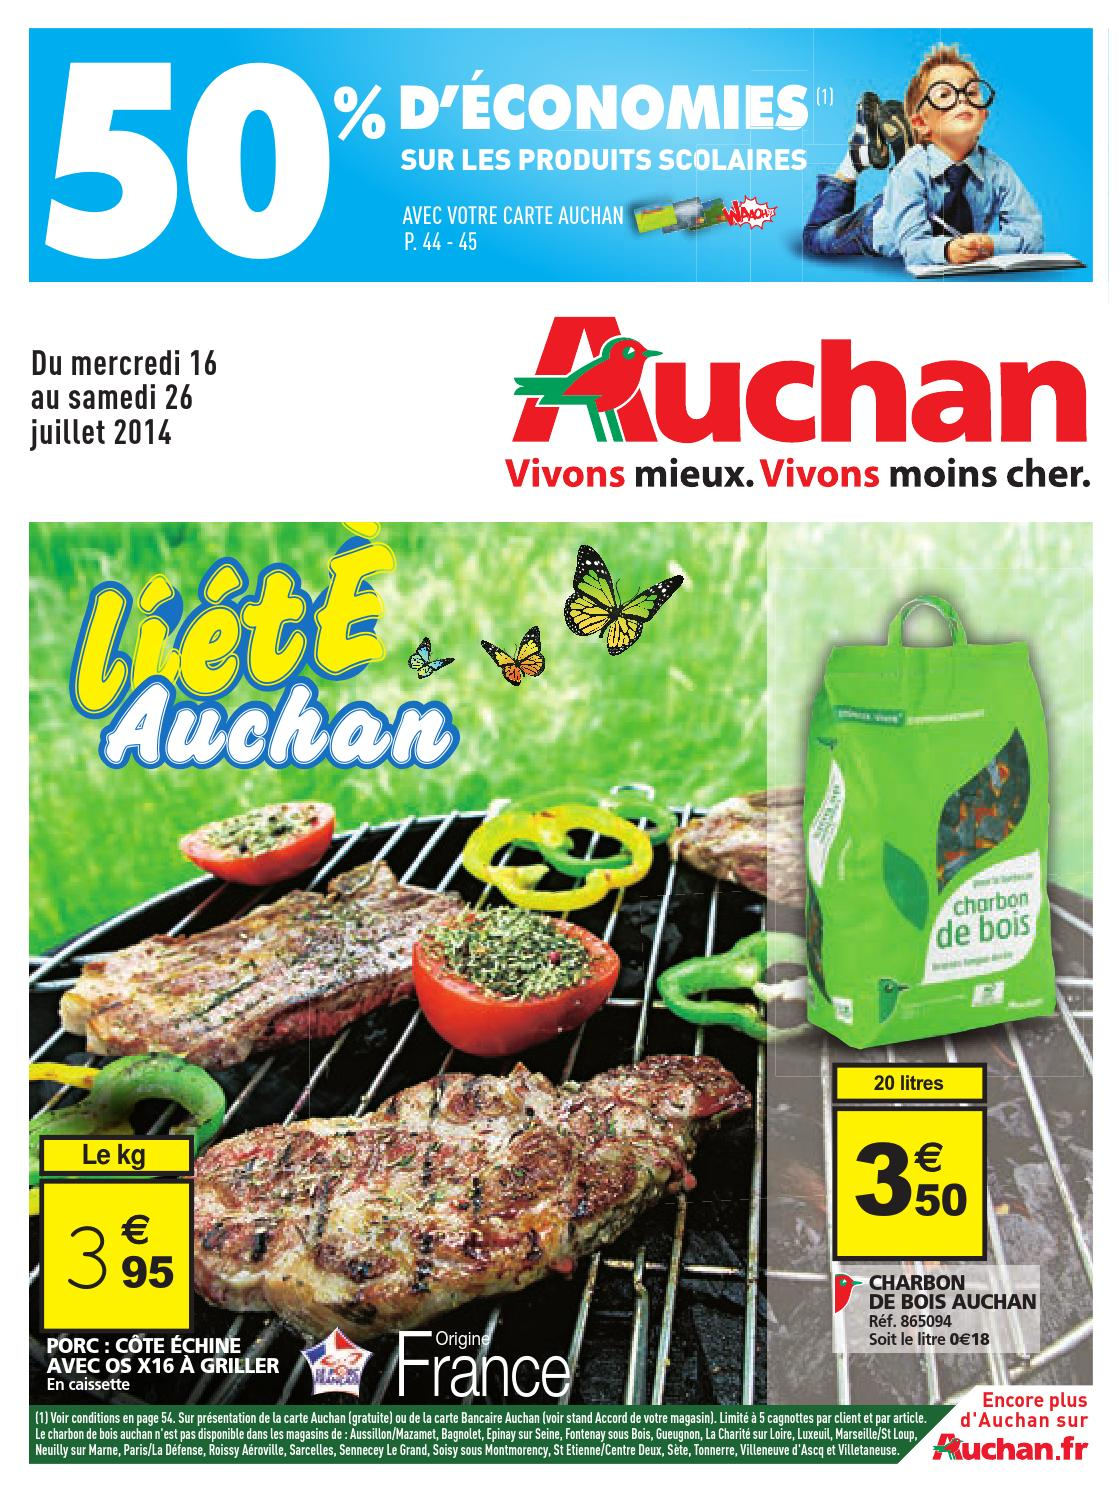 Auchan catalogue 16 26juillet2014 by PromoCatalogues.com - issuu